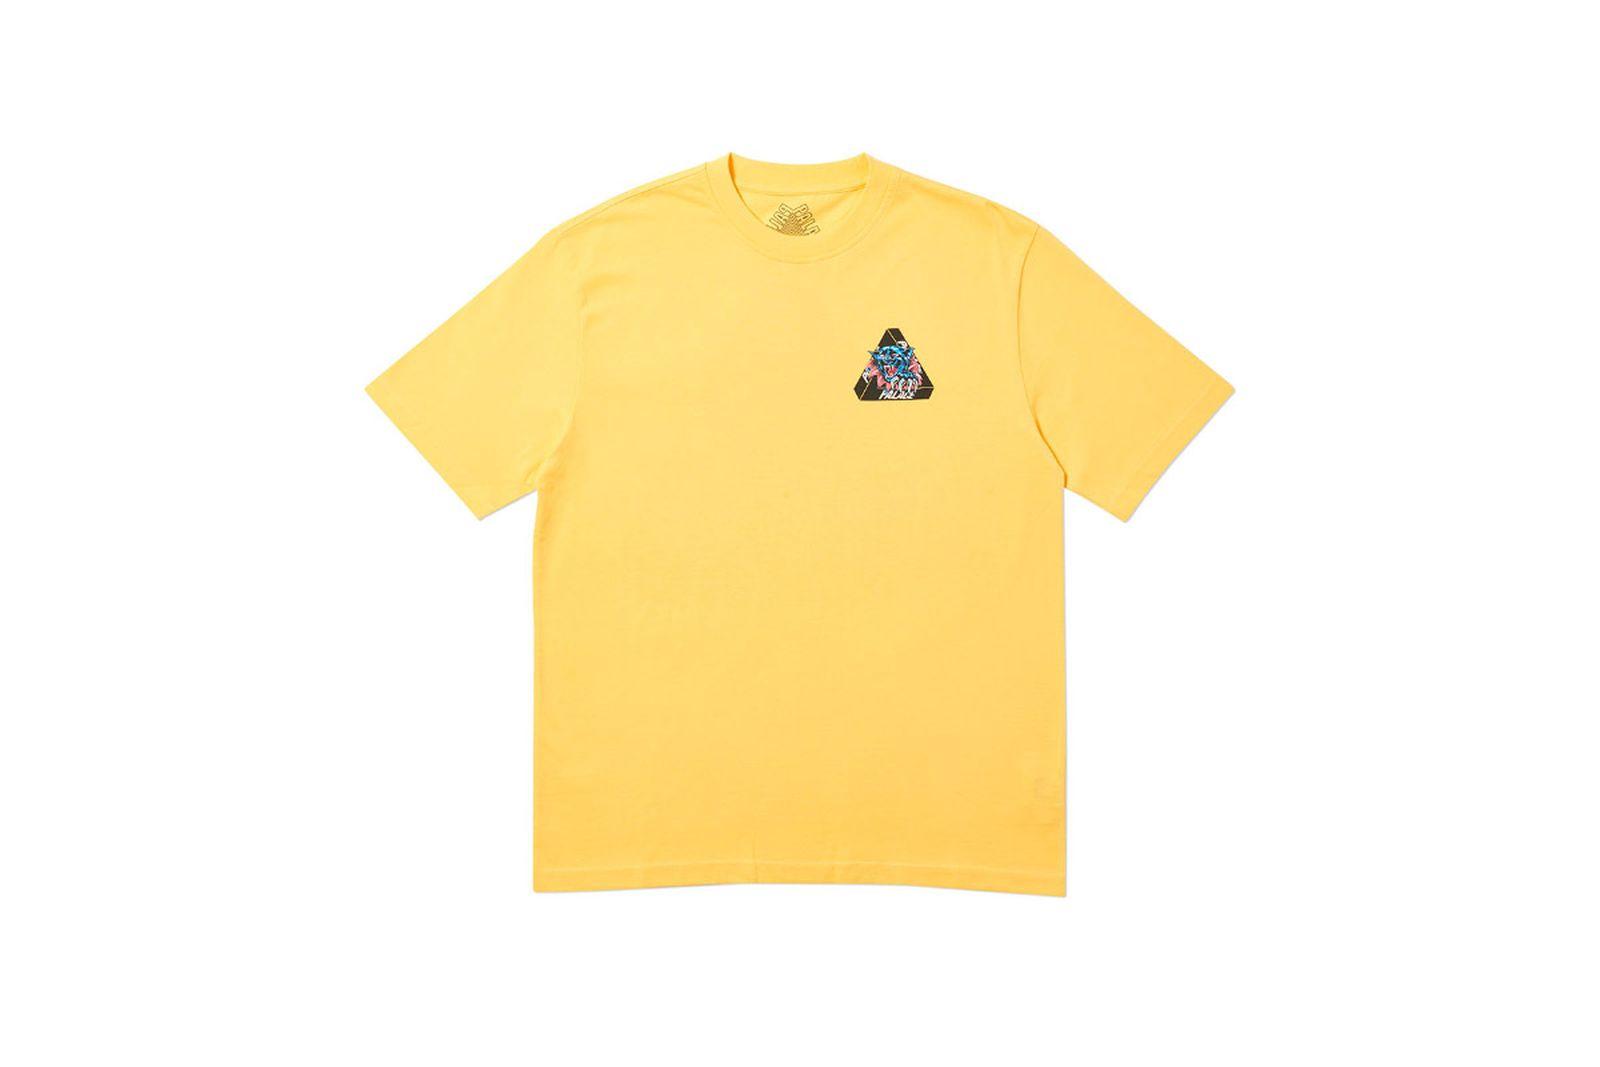 Palace 2019 Autumn T Shirt Ripped yellow front